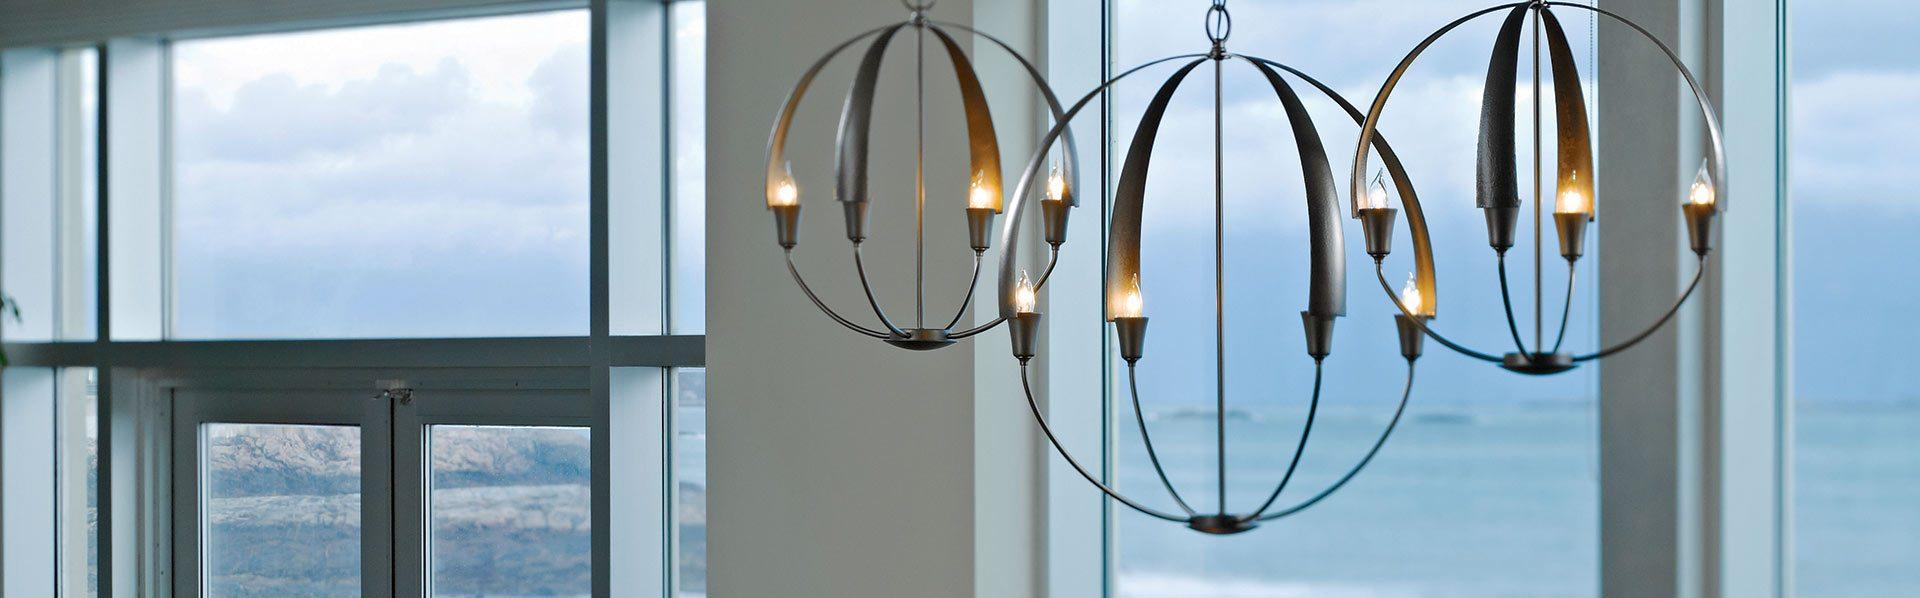 lyman lamps portage mi shapeyourminds com